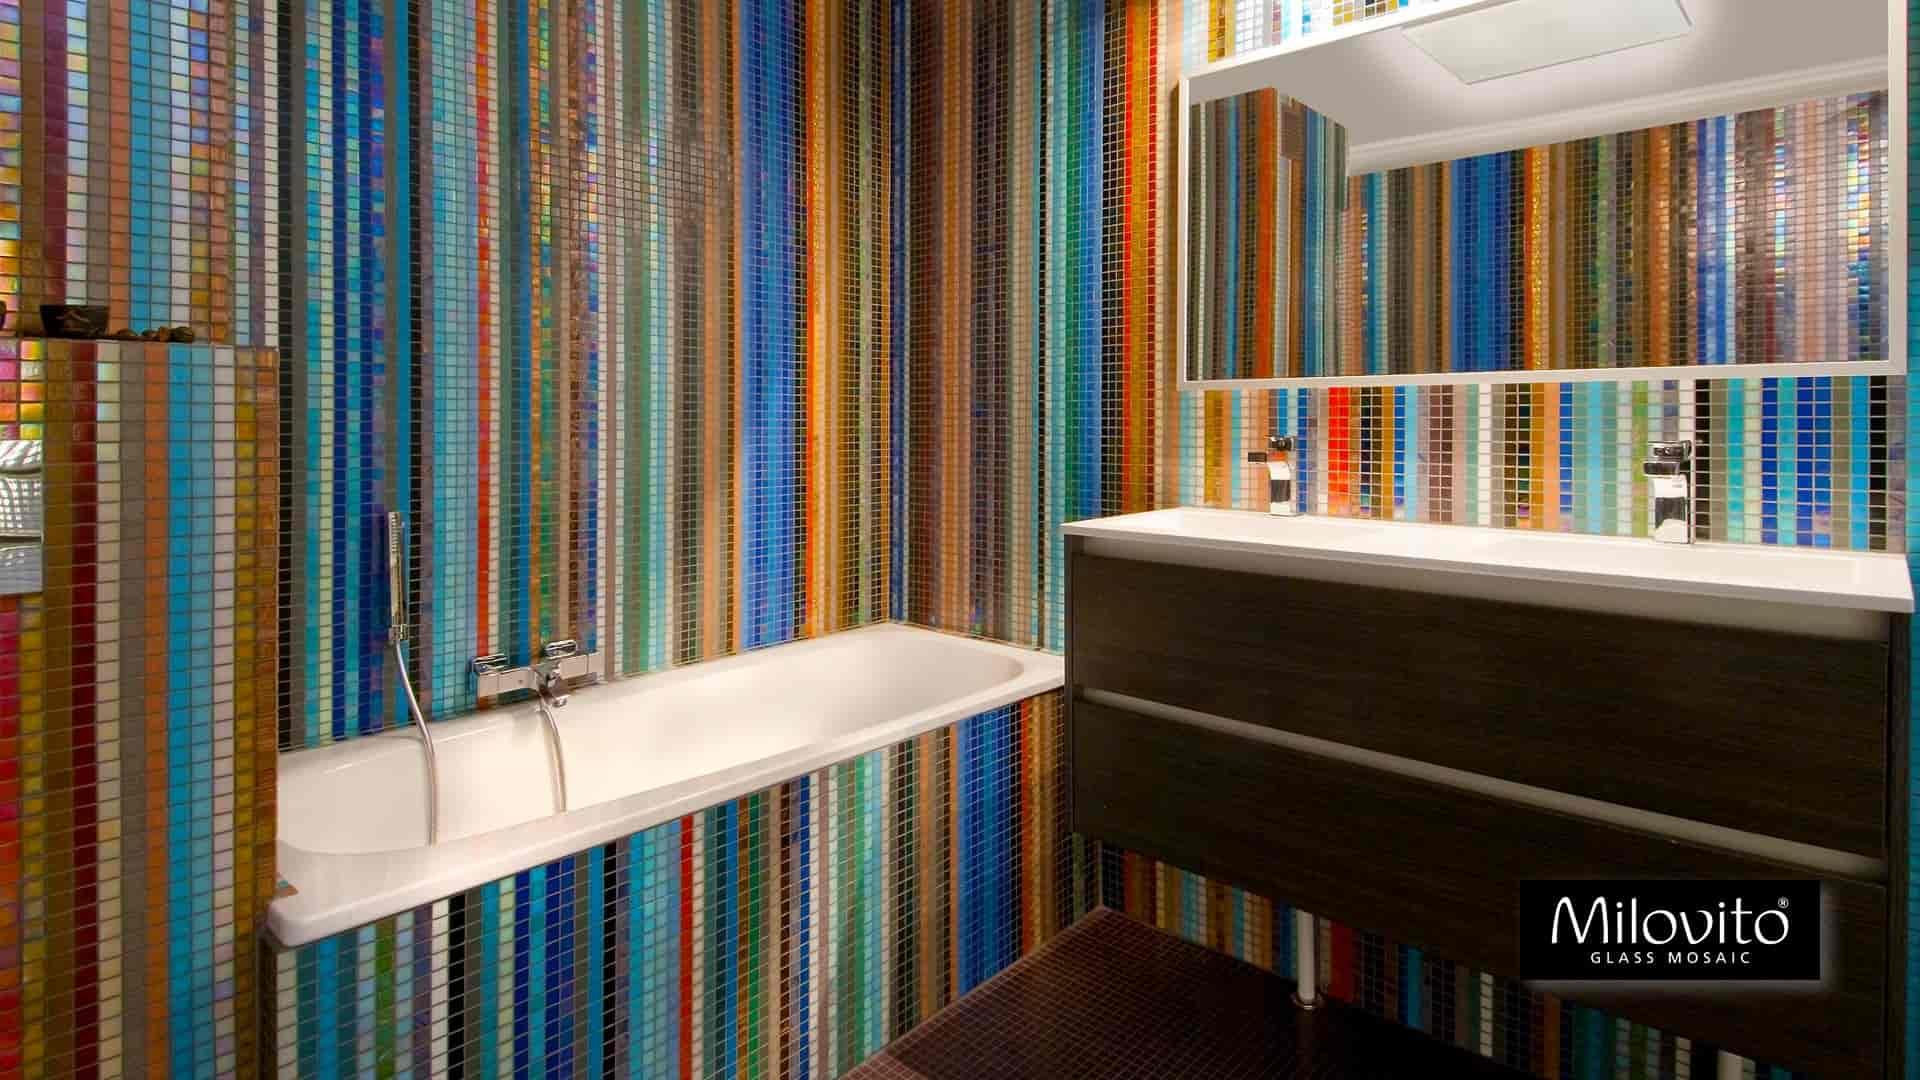 Glasmozaiek Voor Badkamer : Unieke badkamers met bespoke glasmozaïek. design productie én